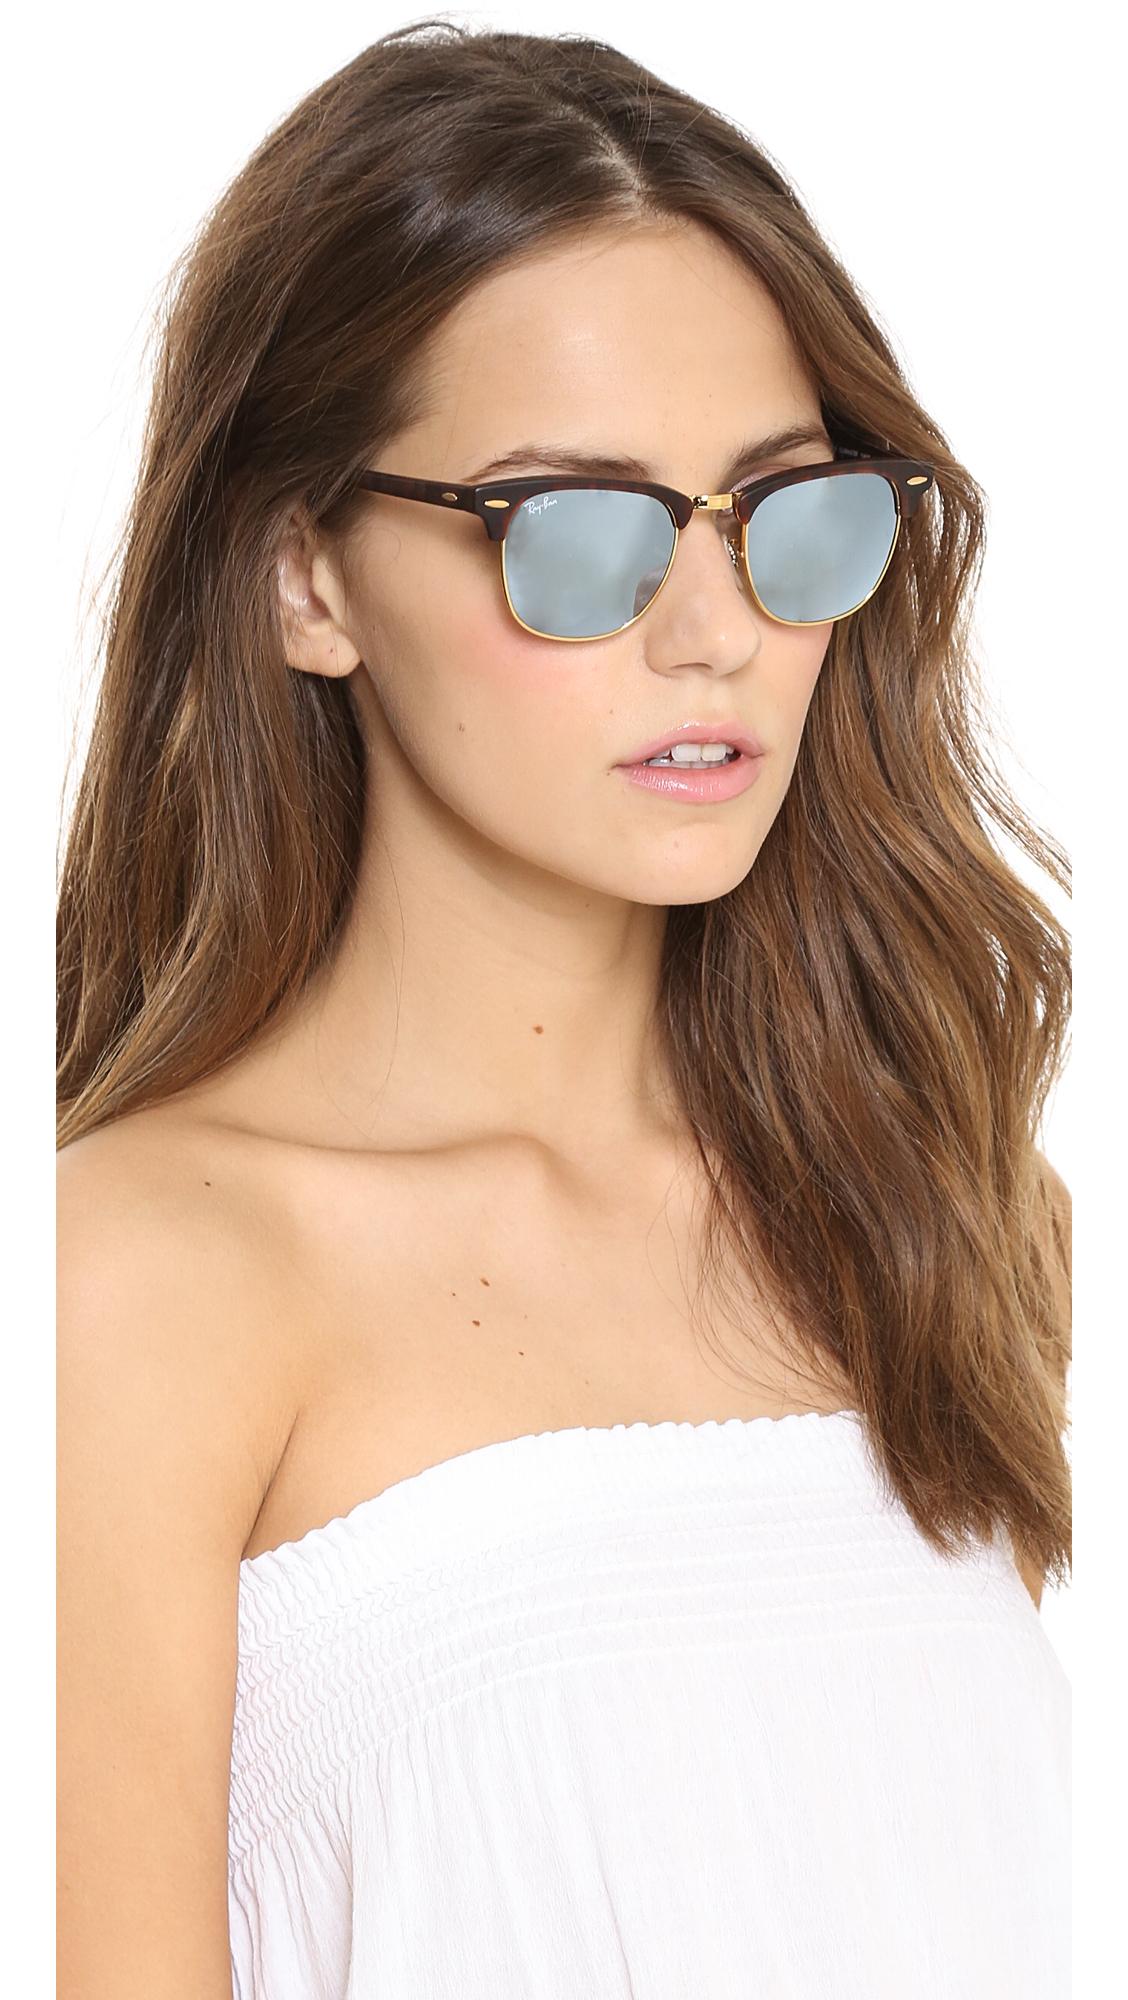 Ray Ban Mirrored Clubmaster Sunglasses Sand Havana Grey